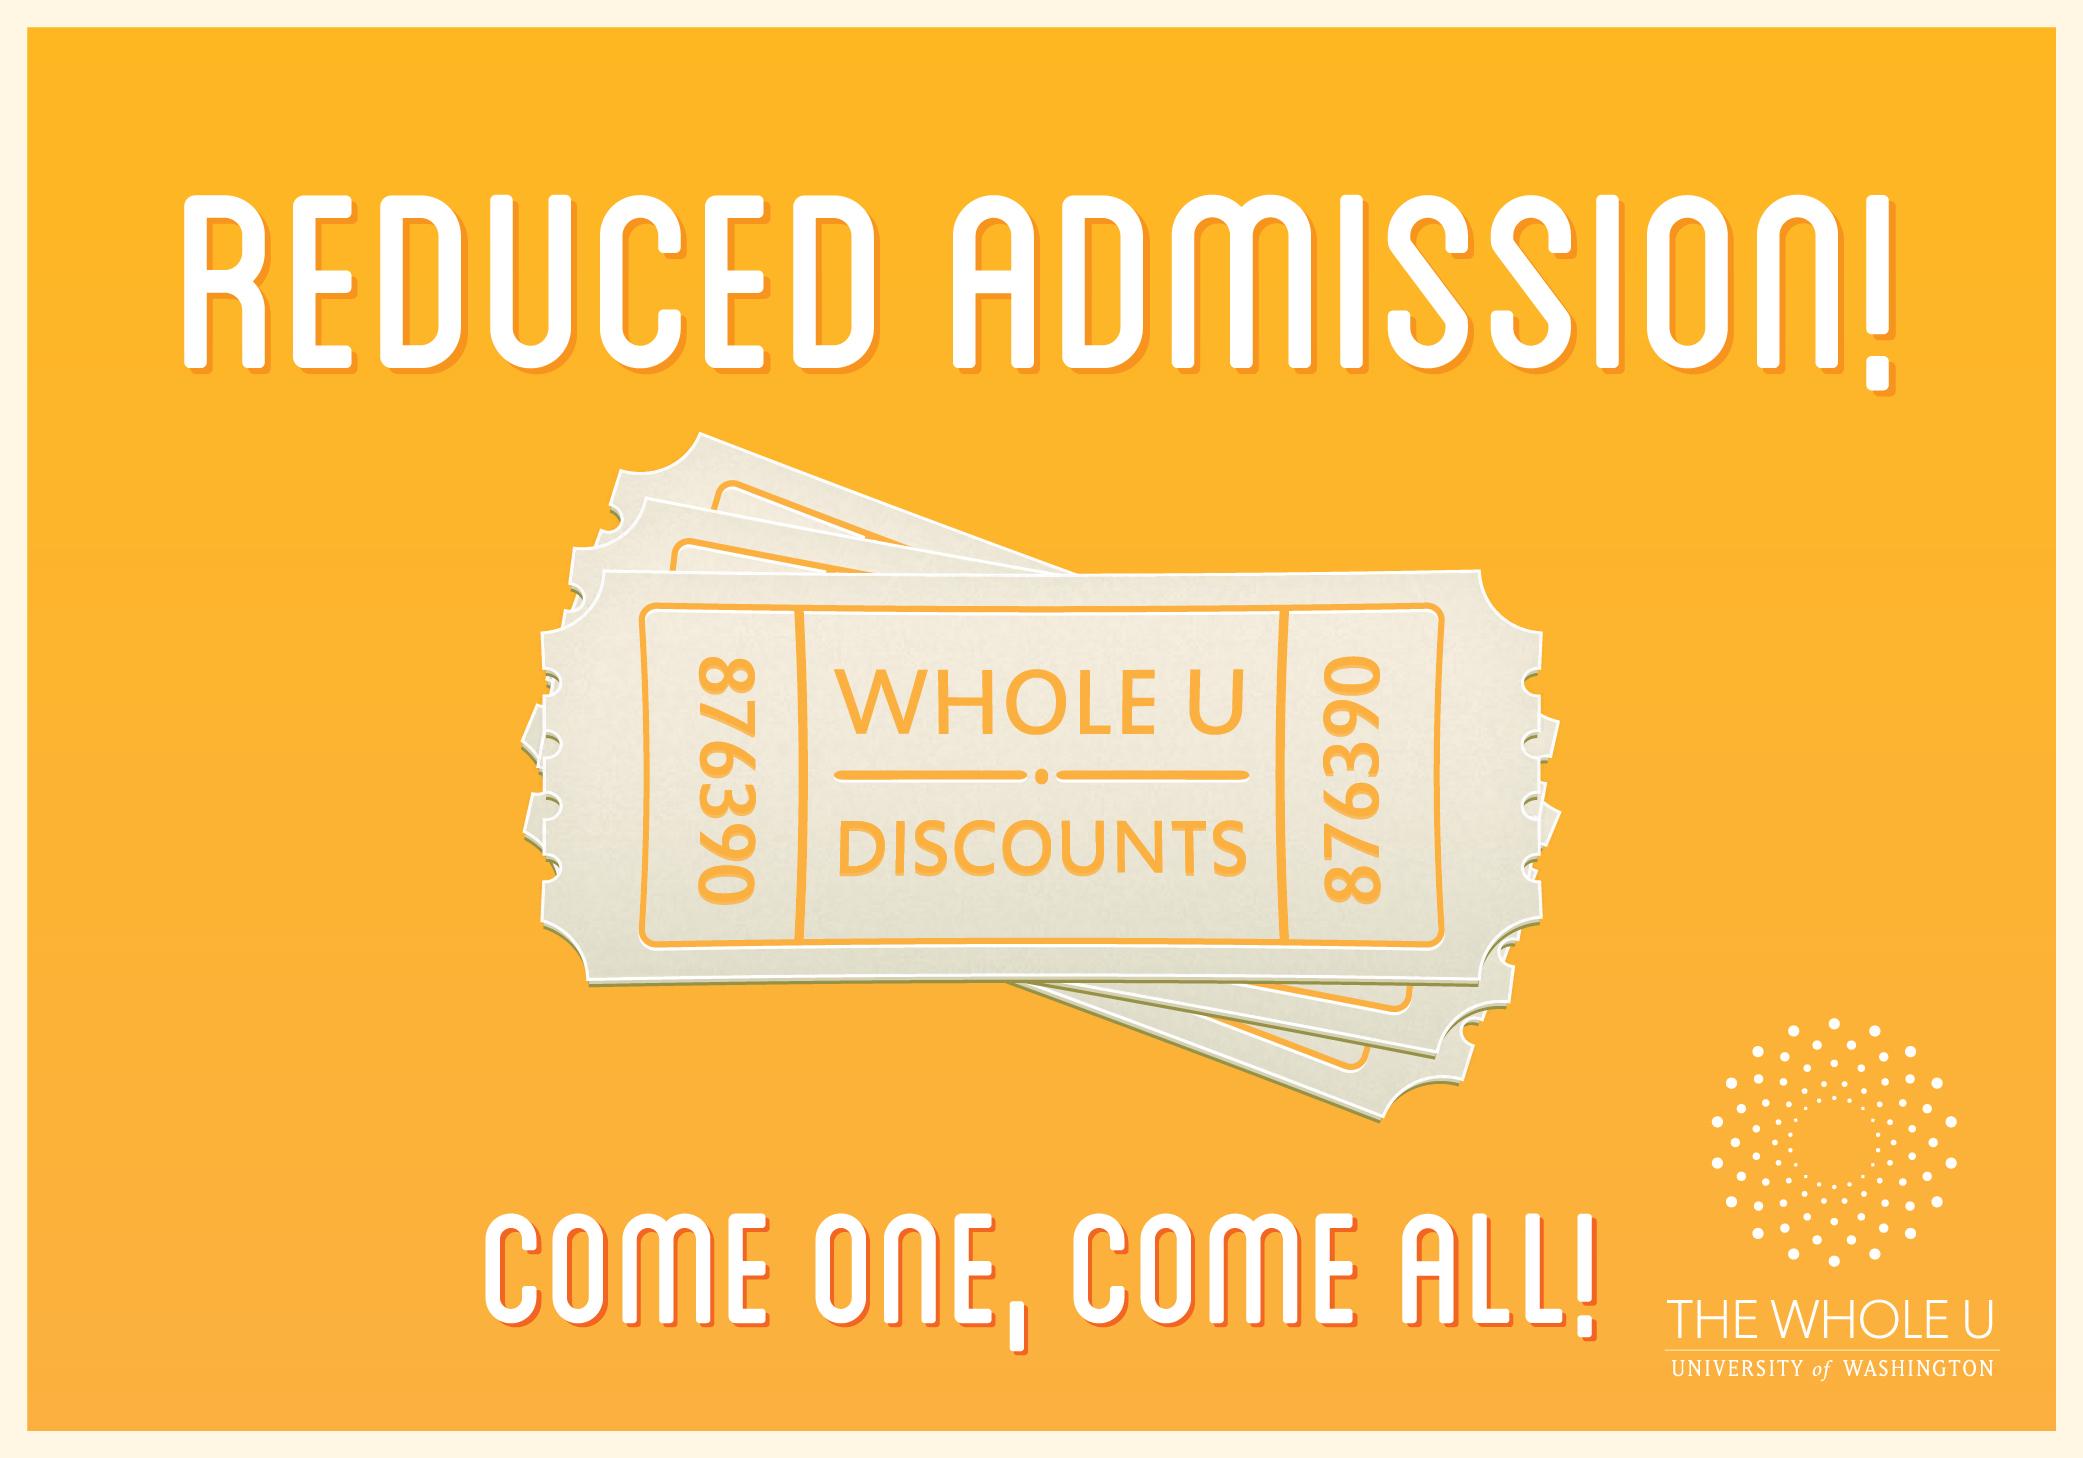 uw faculty and staff discounts